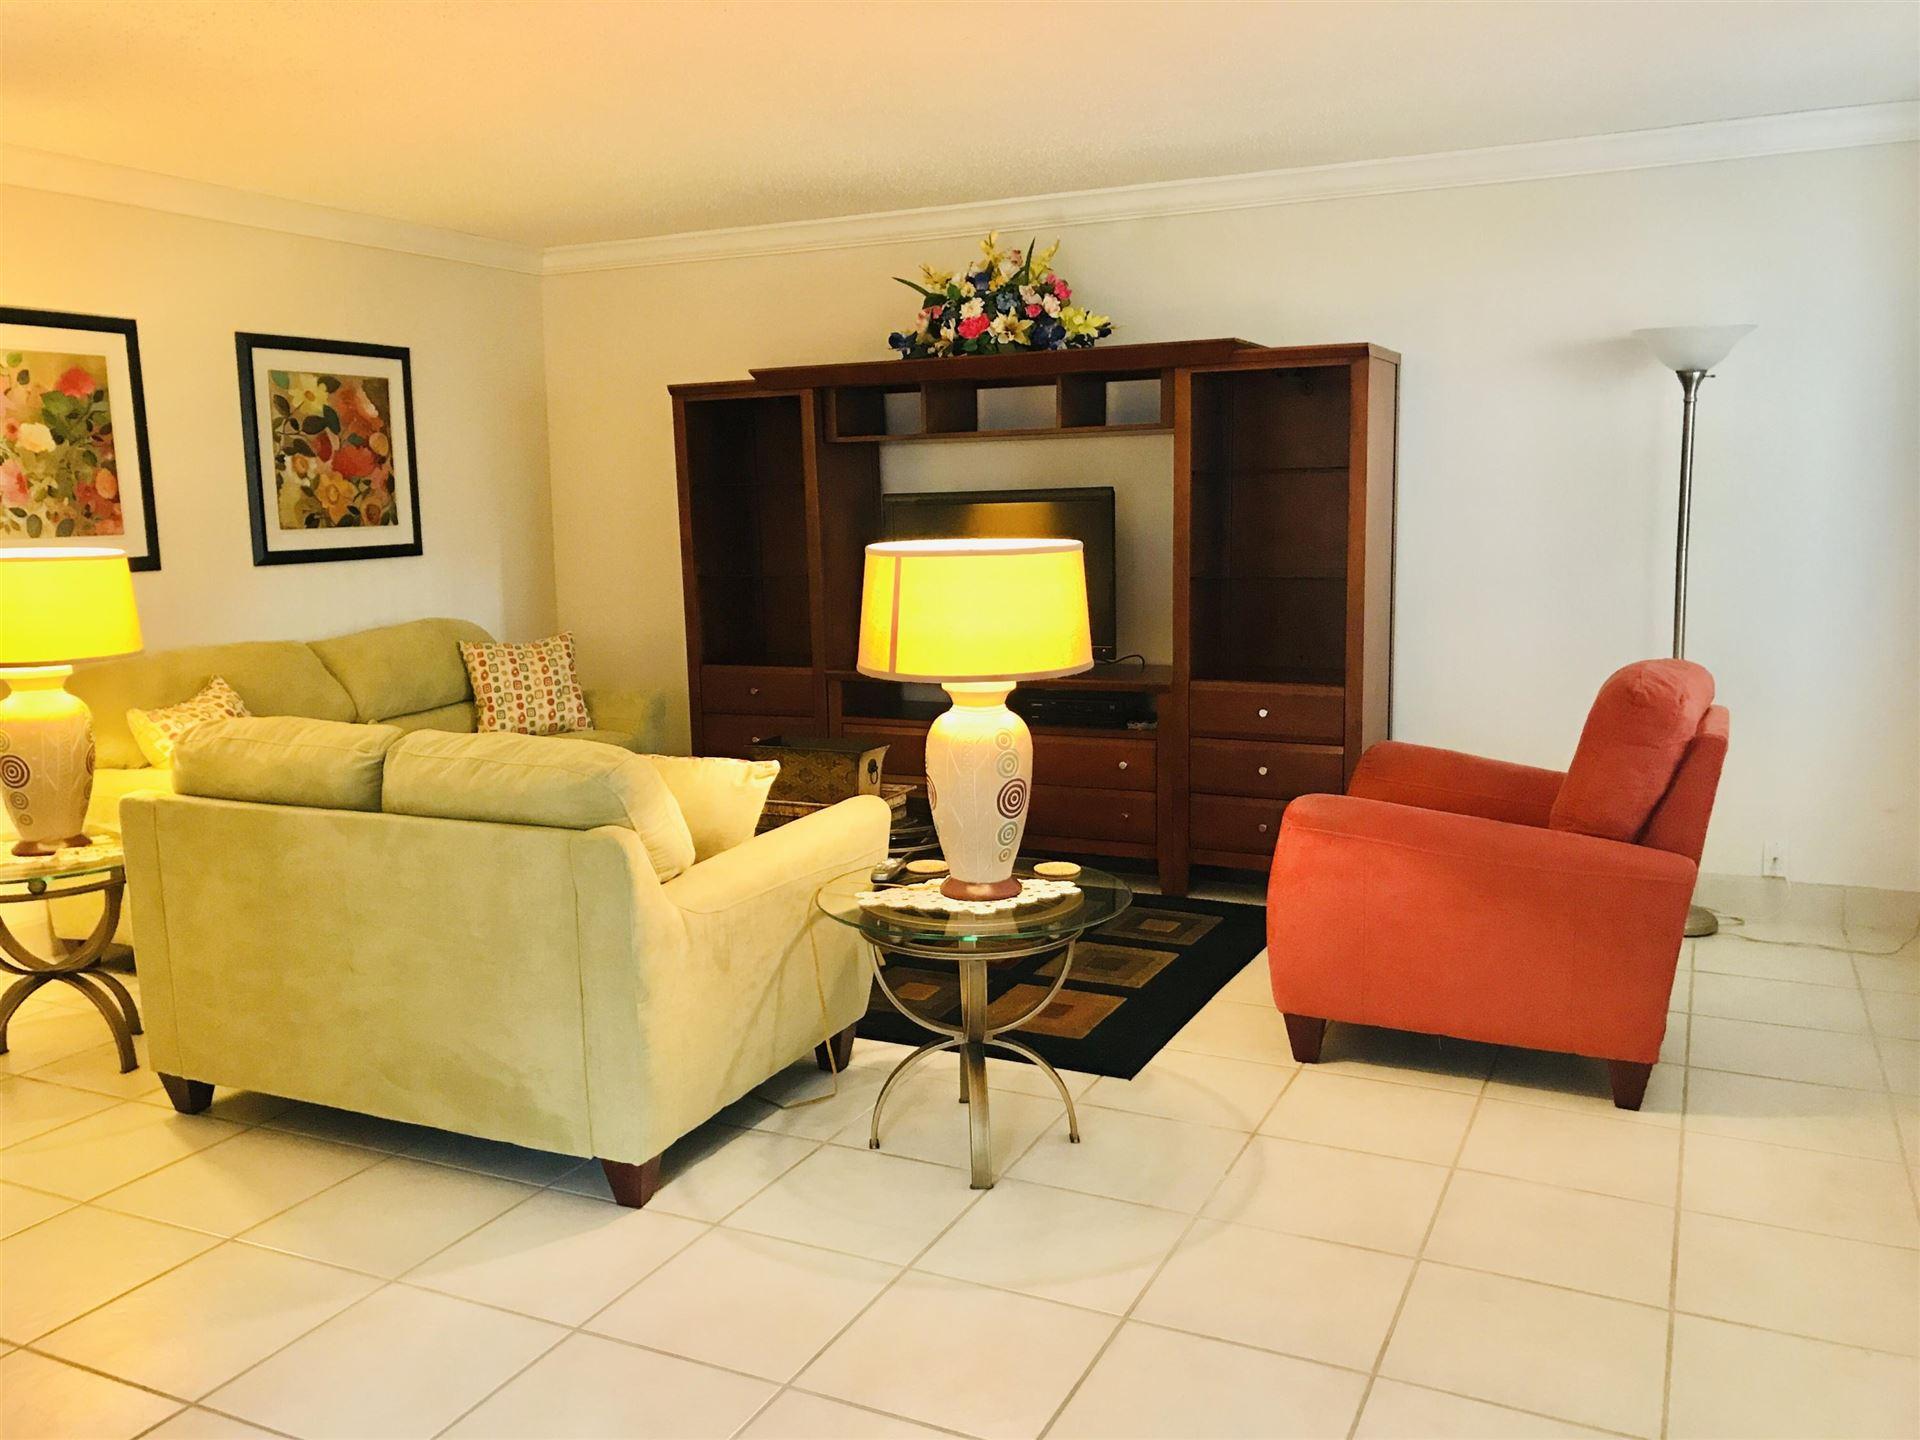 344 Brittany H, Delray Beach, FL 33446 - #: RX-10683844